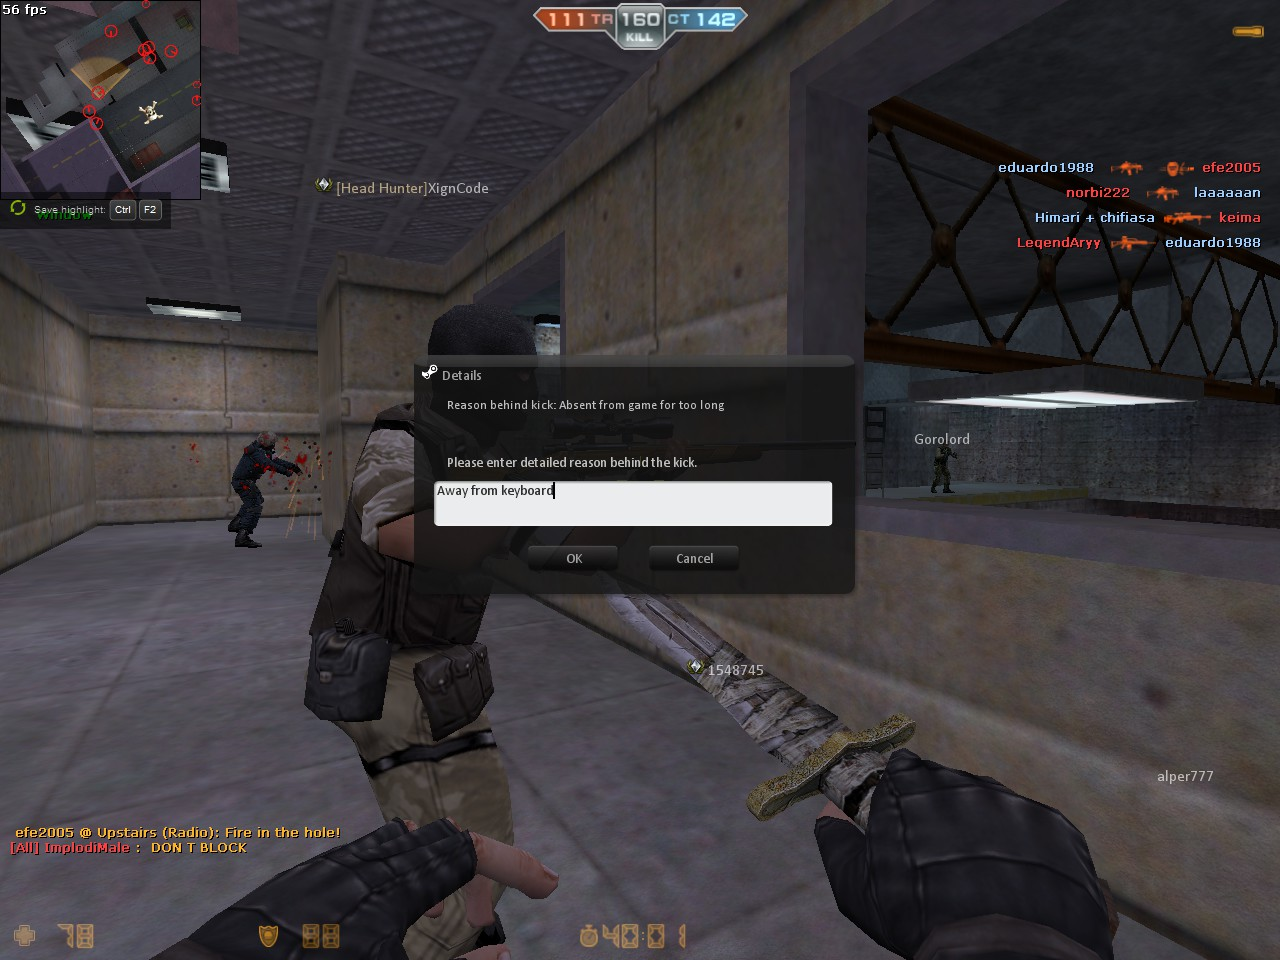 Votekick | Counter Strike Online Wiki | FANDOM powered by Wikia